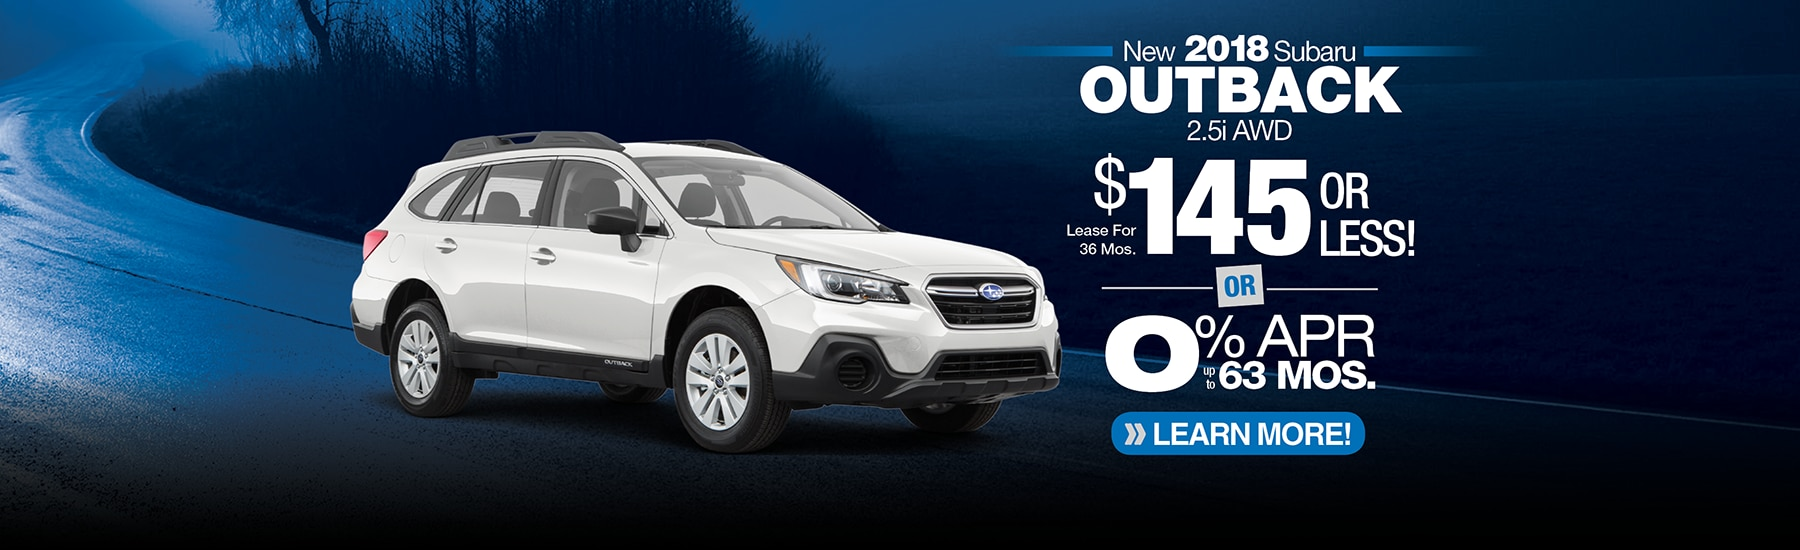 Premier Subaru Watertown >> Premier Subaru Watertown Connecticut Dealer Near Me | New ...